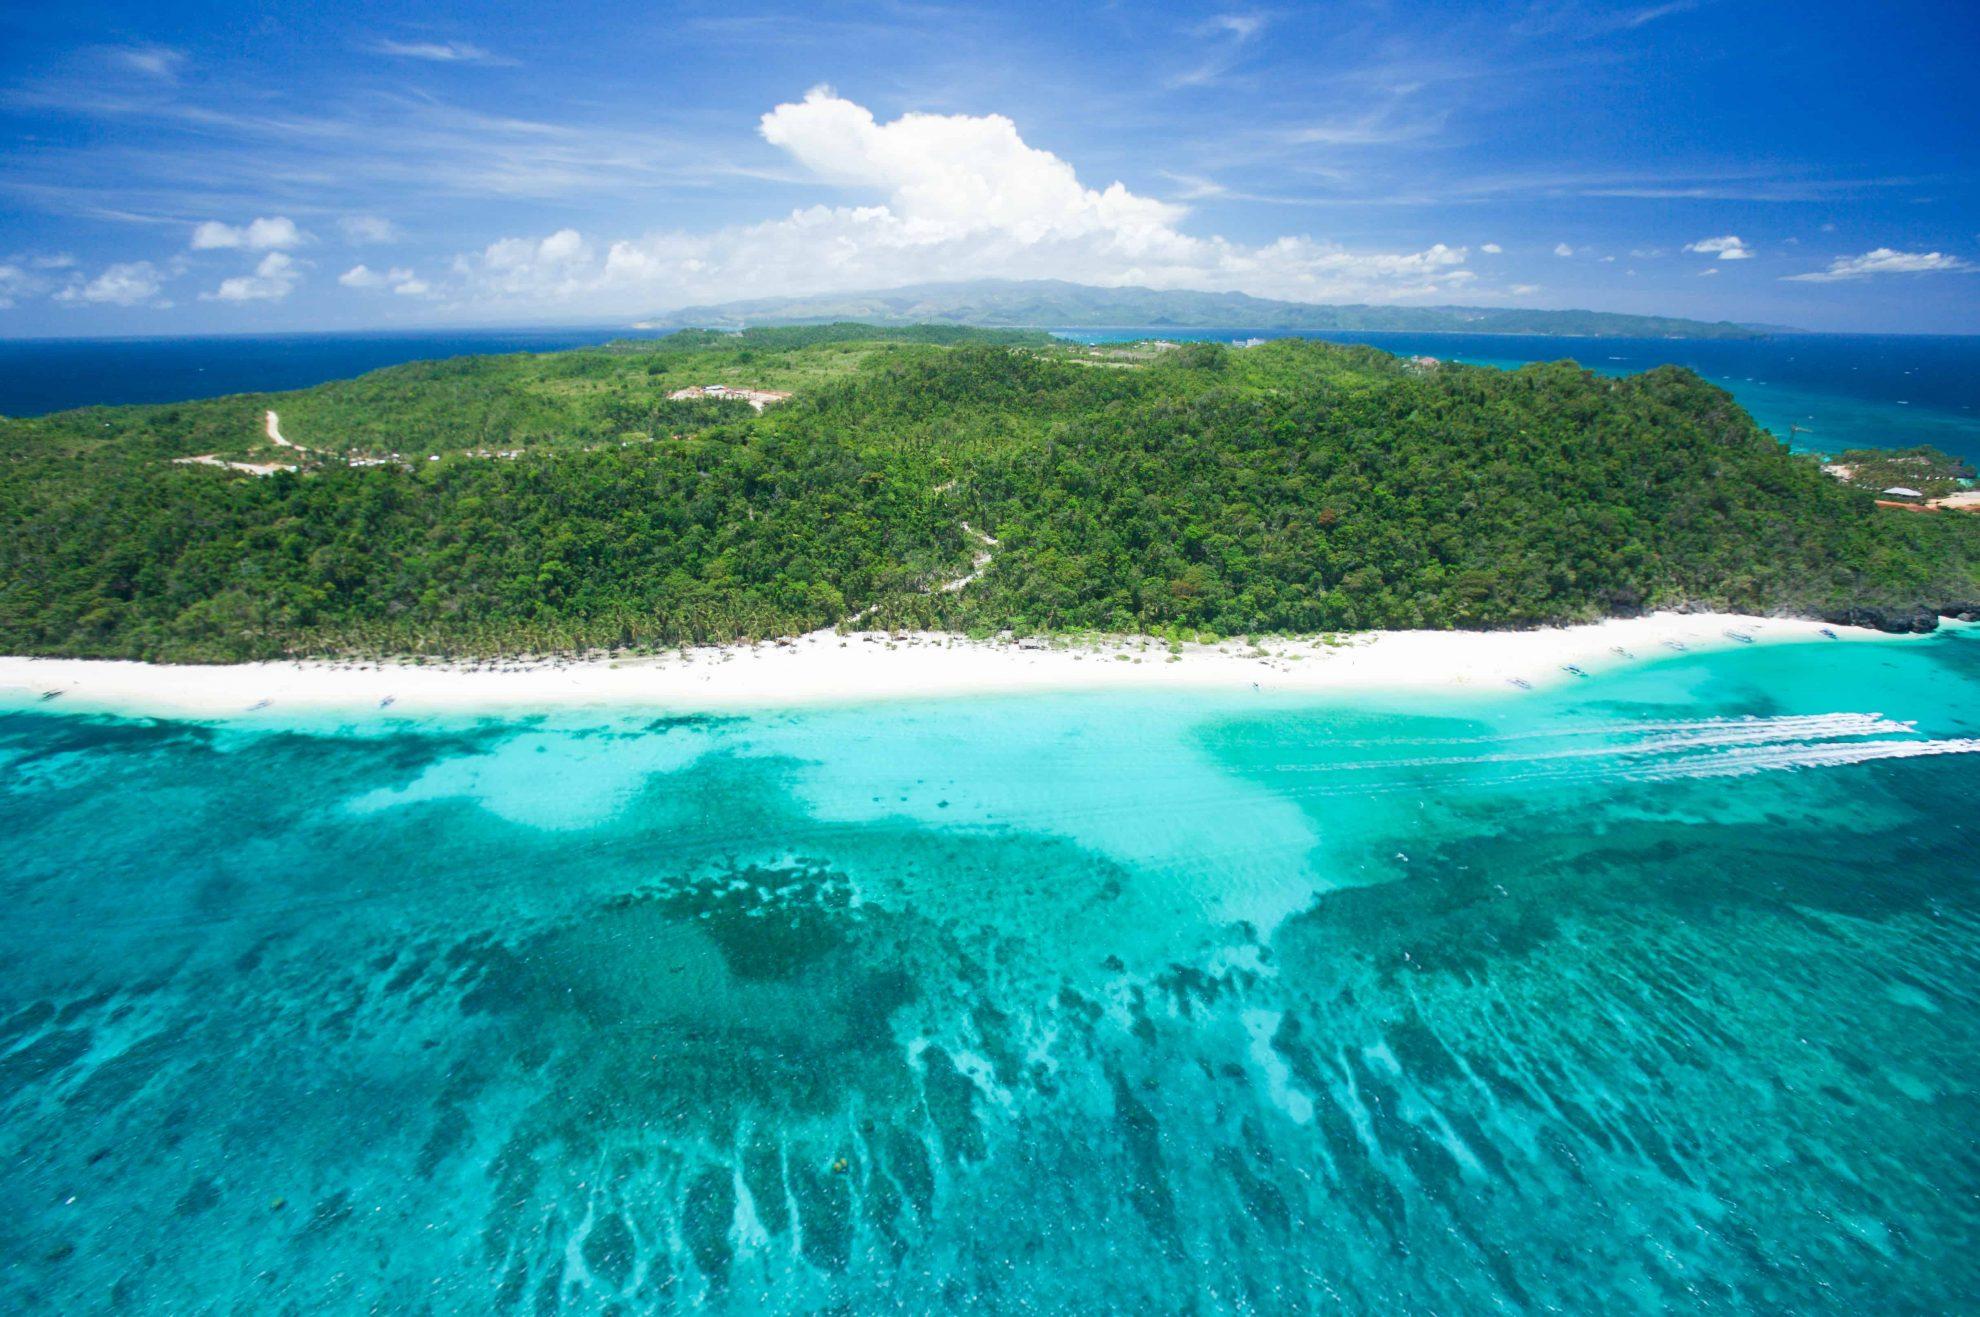 Boracay-Visayas-Luftaufnahme-David Hettich